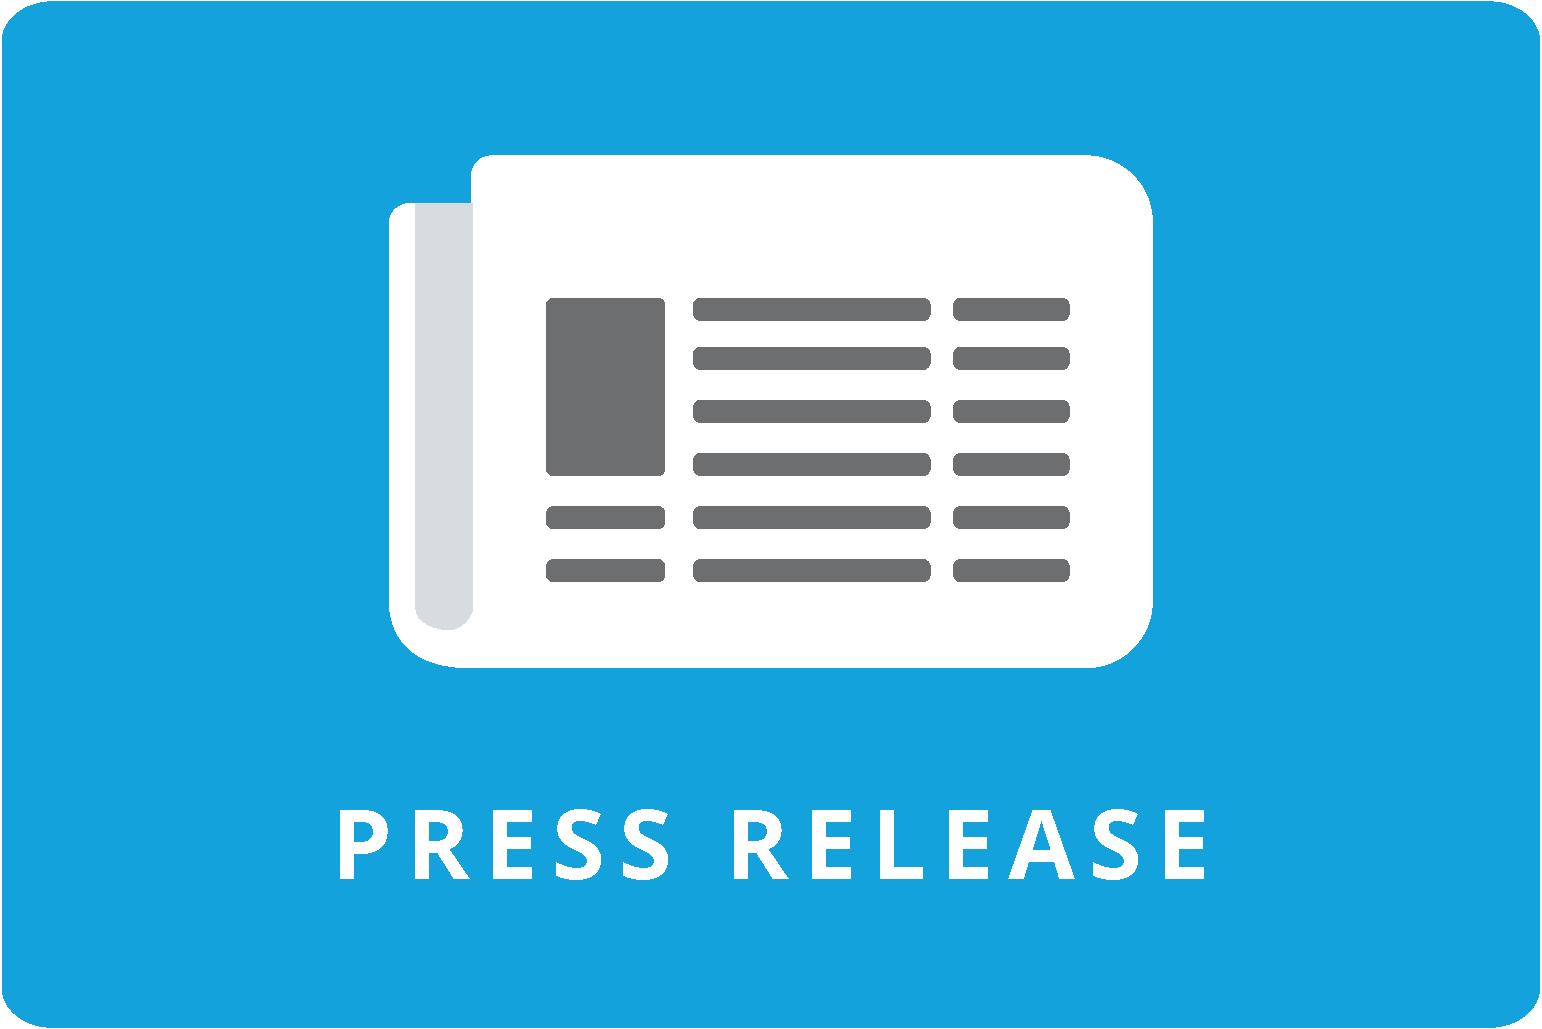 How To Measure Press Release Performance Bloggingpro